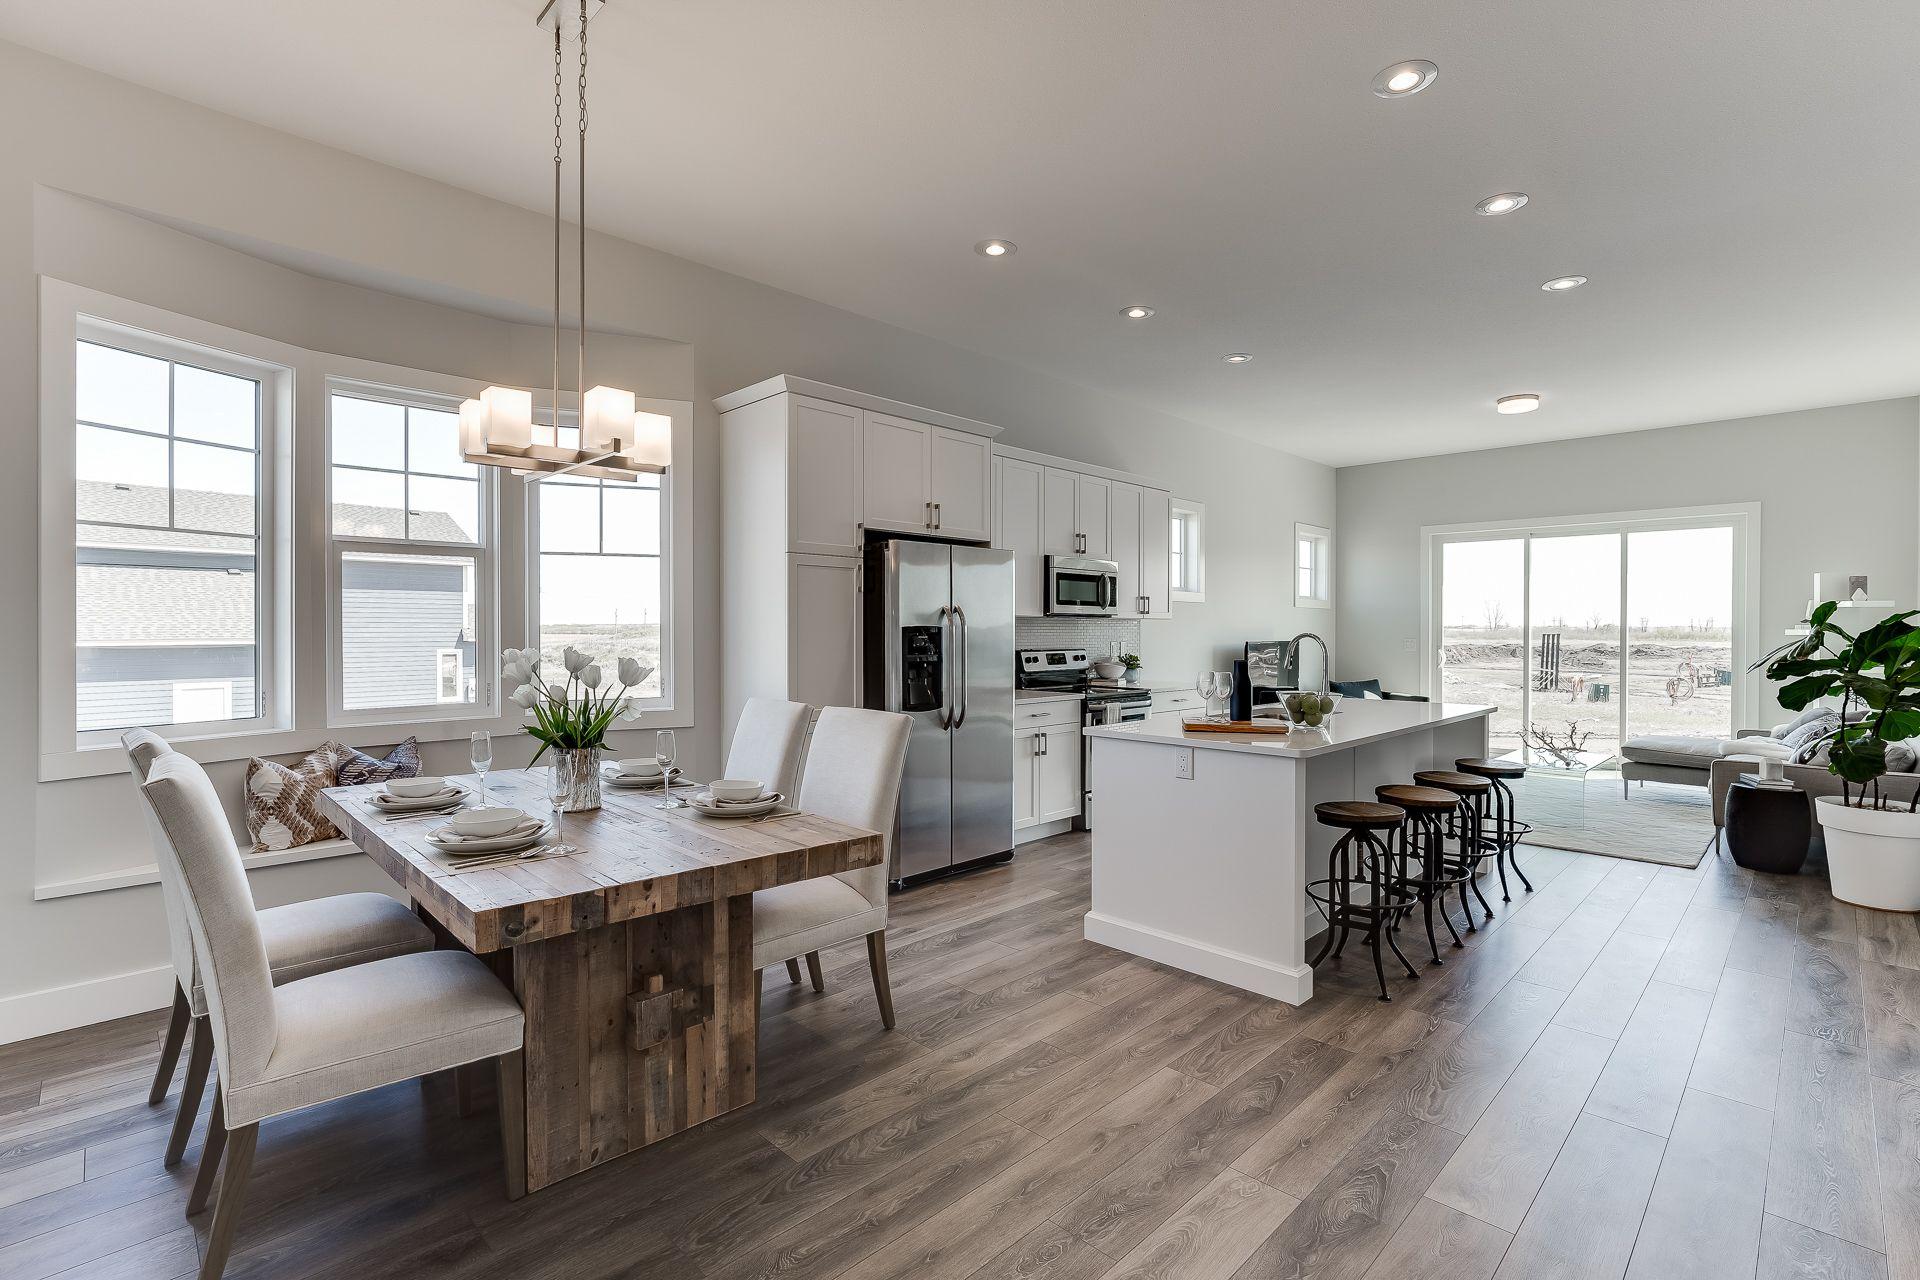 image result for open concept main floor kitchen remodel kitchen design modern kitchen on kitchen remodel floor id=33079